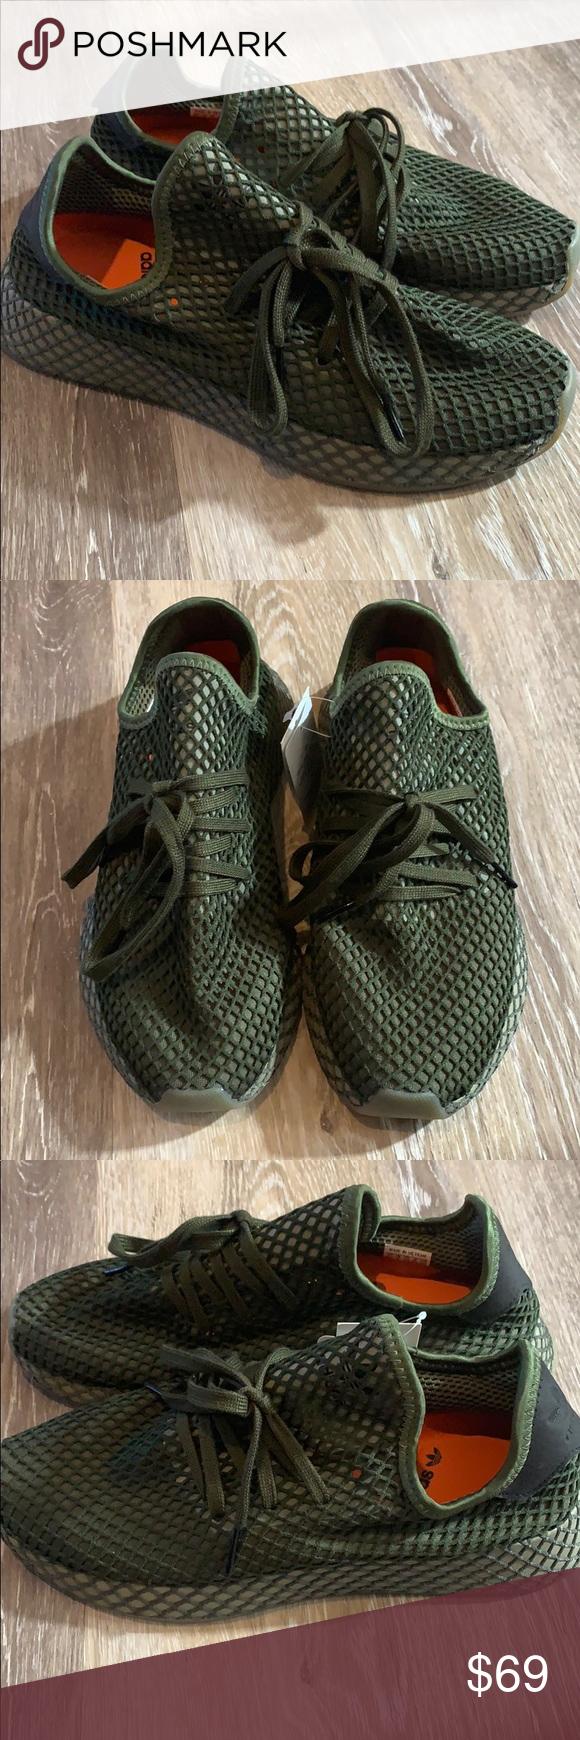 9d0a286b16ebe Adidas Originals Deerupt Runner Mens Lifestyle Adidas Originals Deerupt  Runner Mens Lifestyle Sneaker B41771 Size 8.5 Never worn just missing  original box! ...